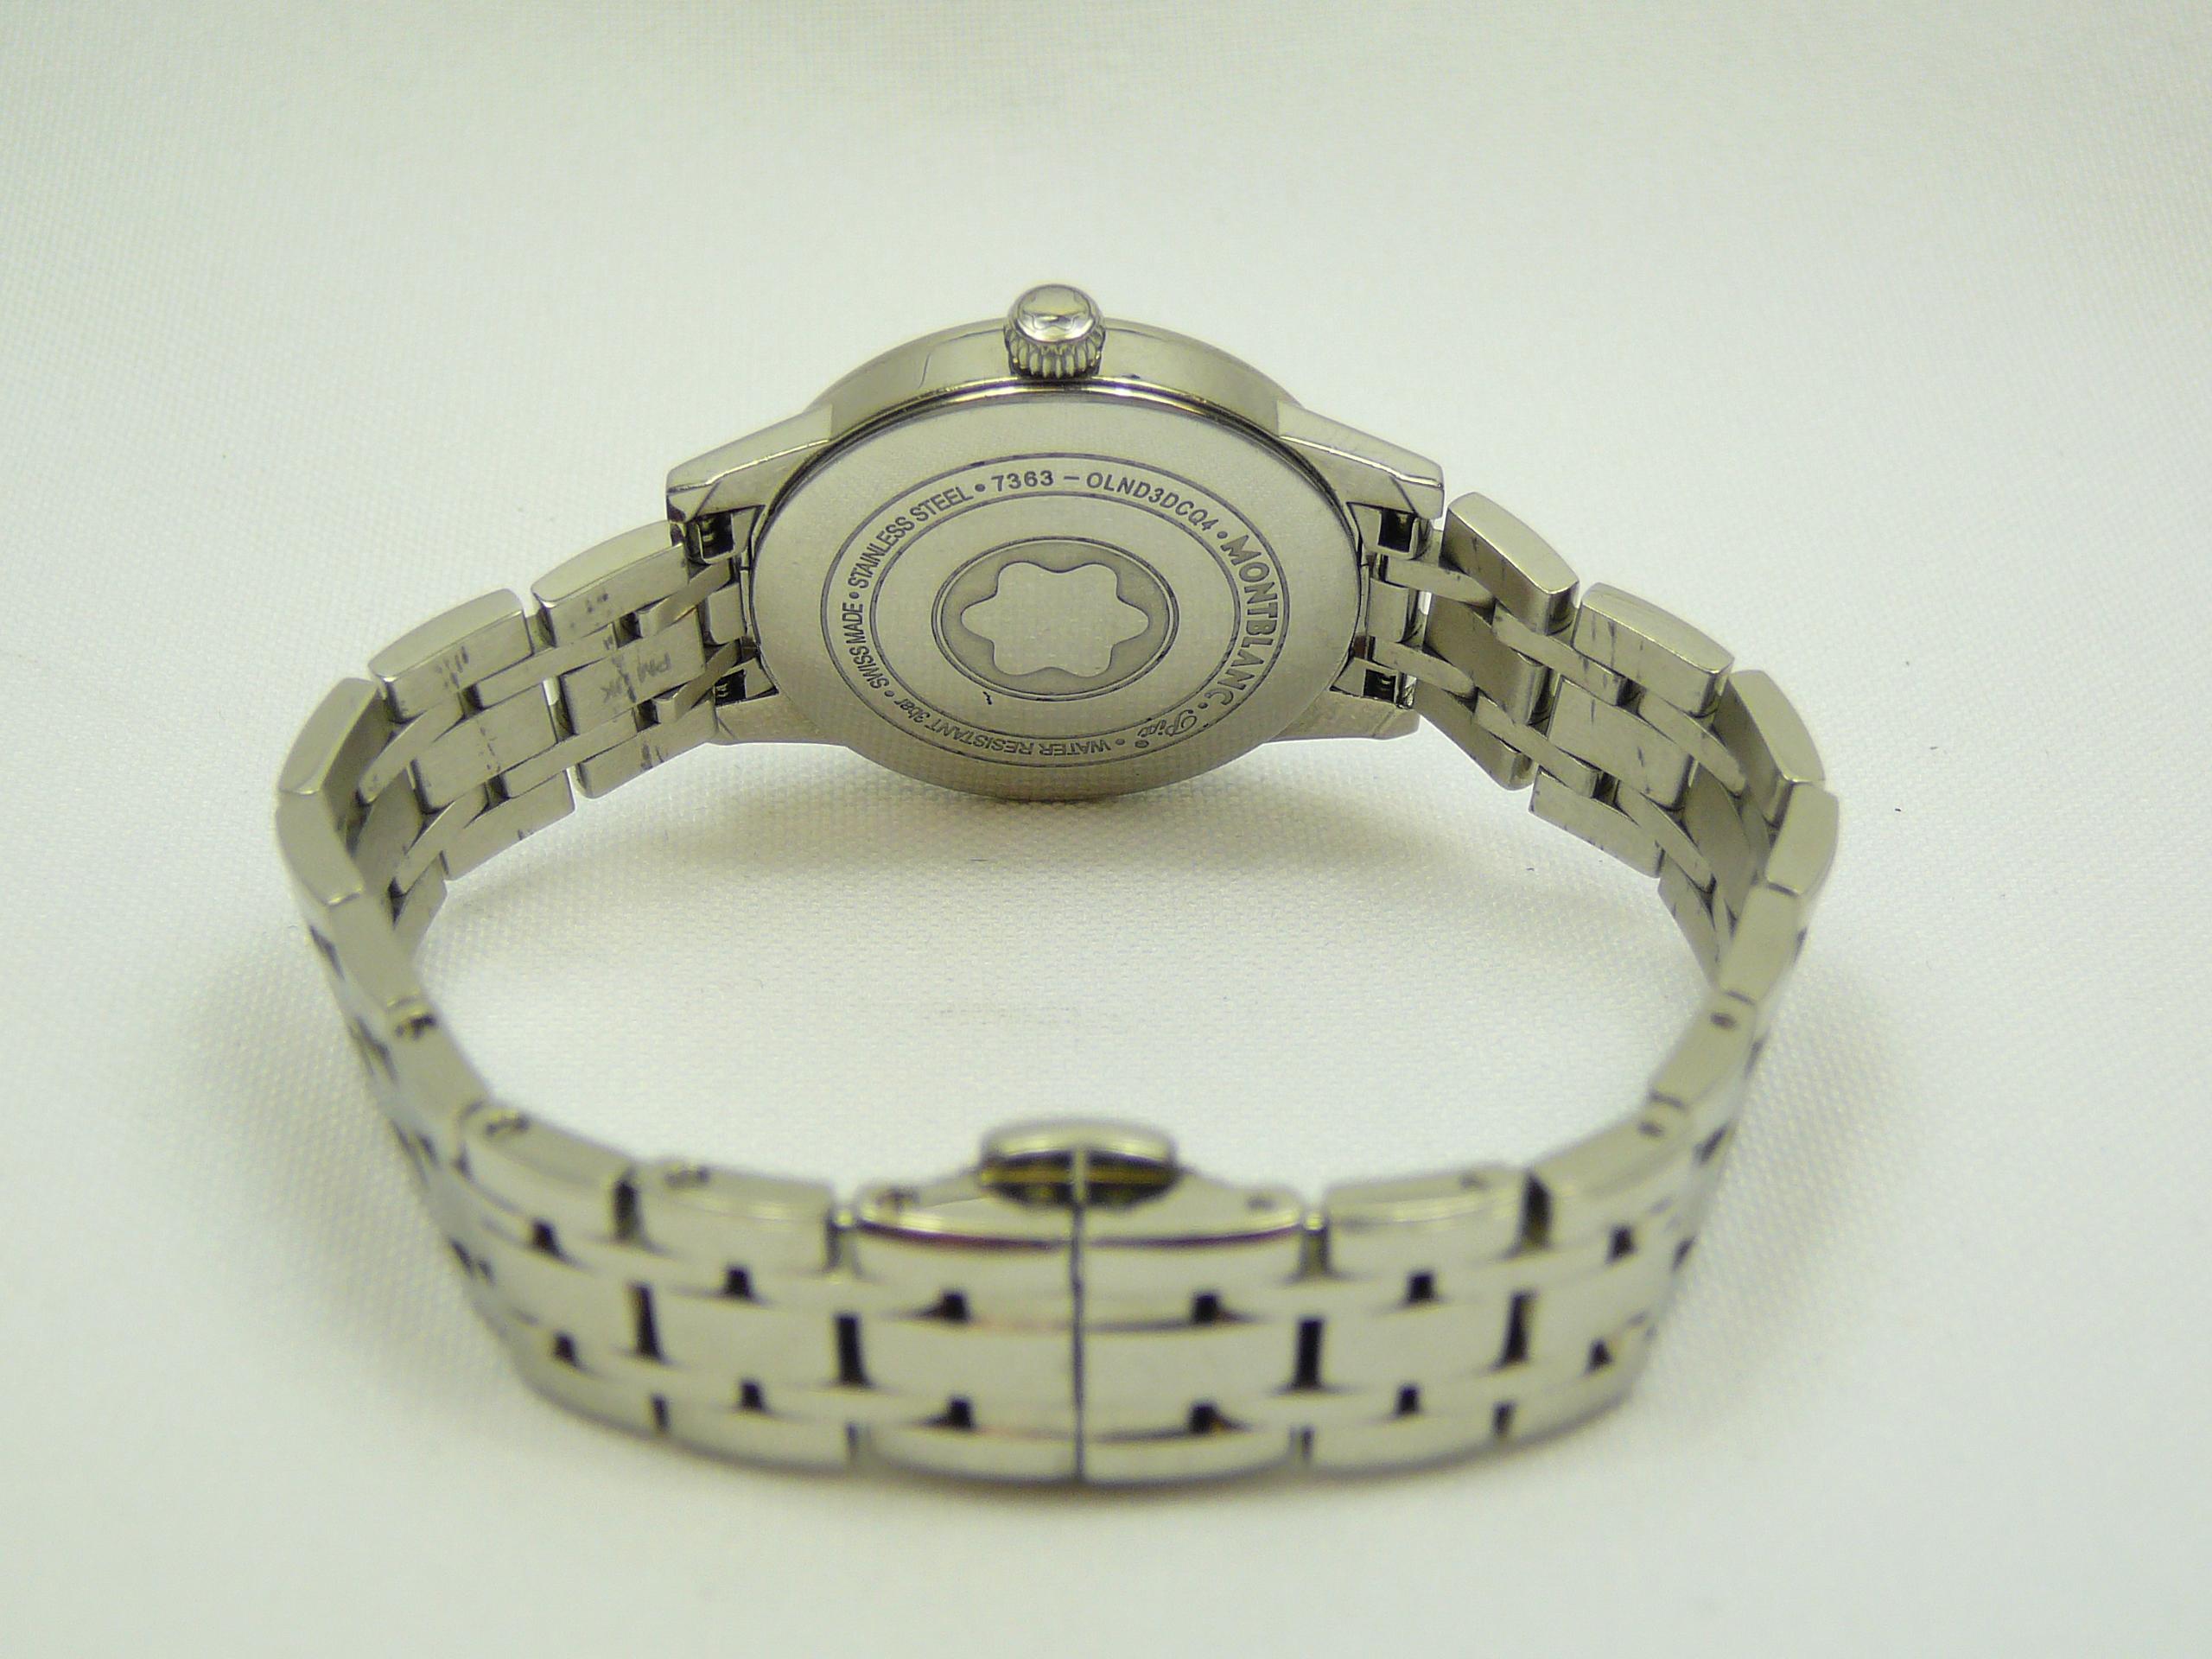 Ladies Montblanc Wrist Watch - Image 3 of 3